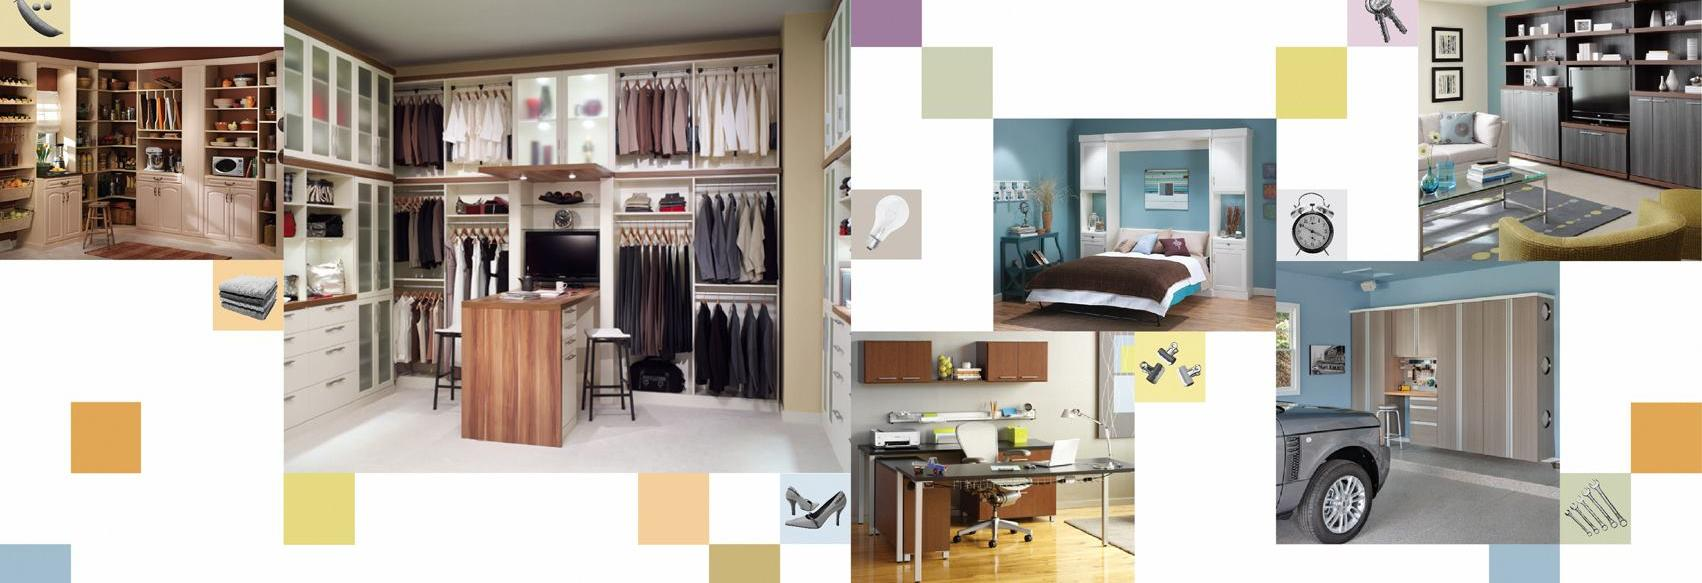 distinctive design closets storage laundry garage home organization build design install